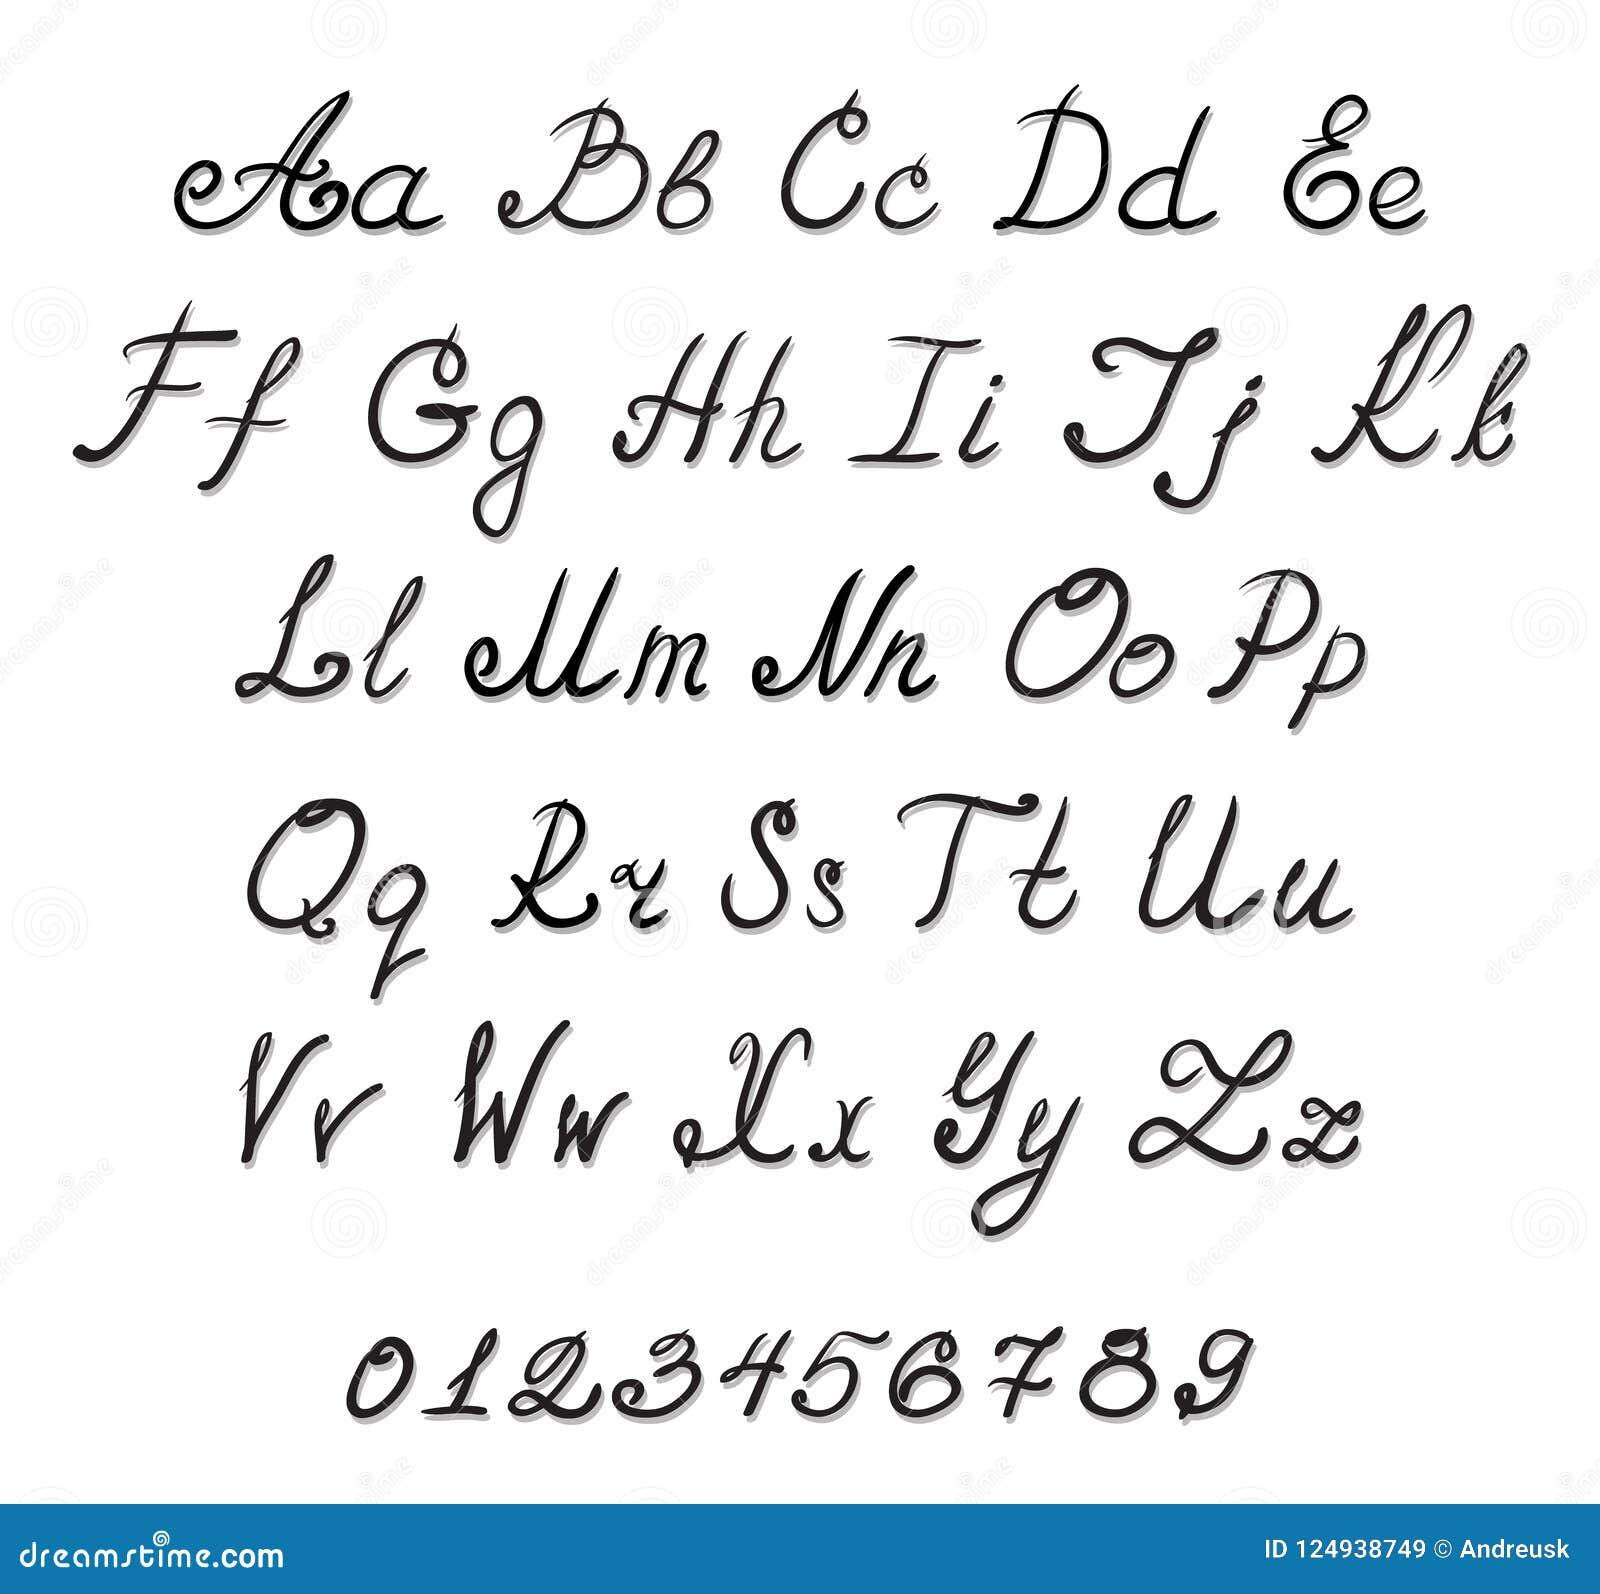 creative lettering ideas